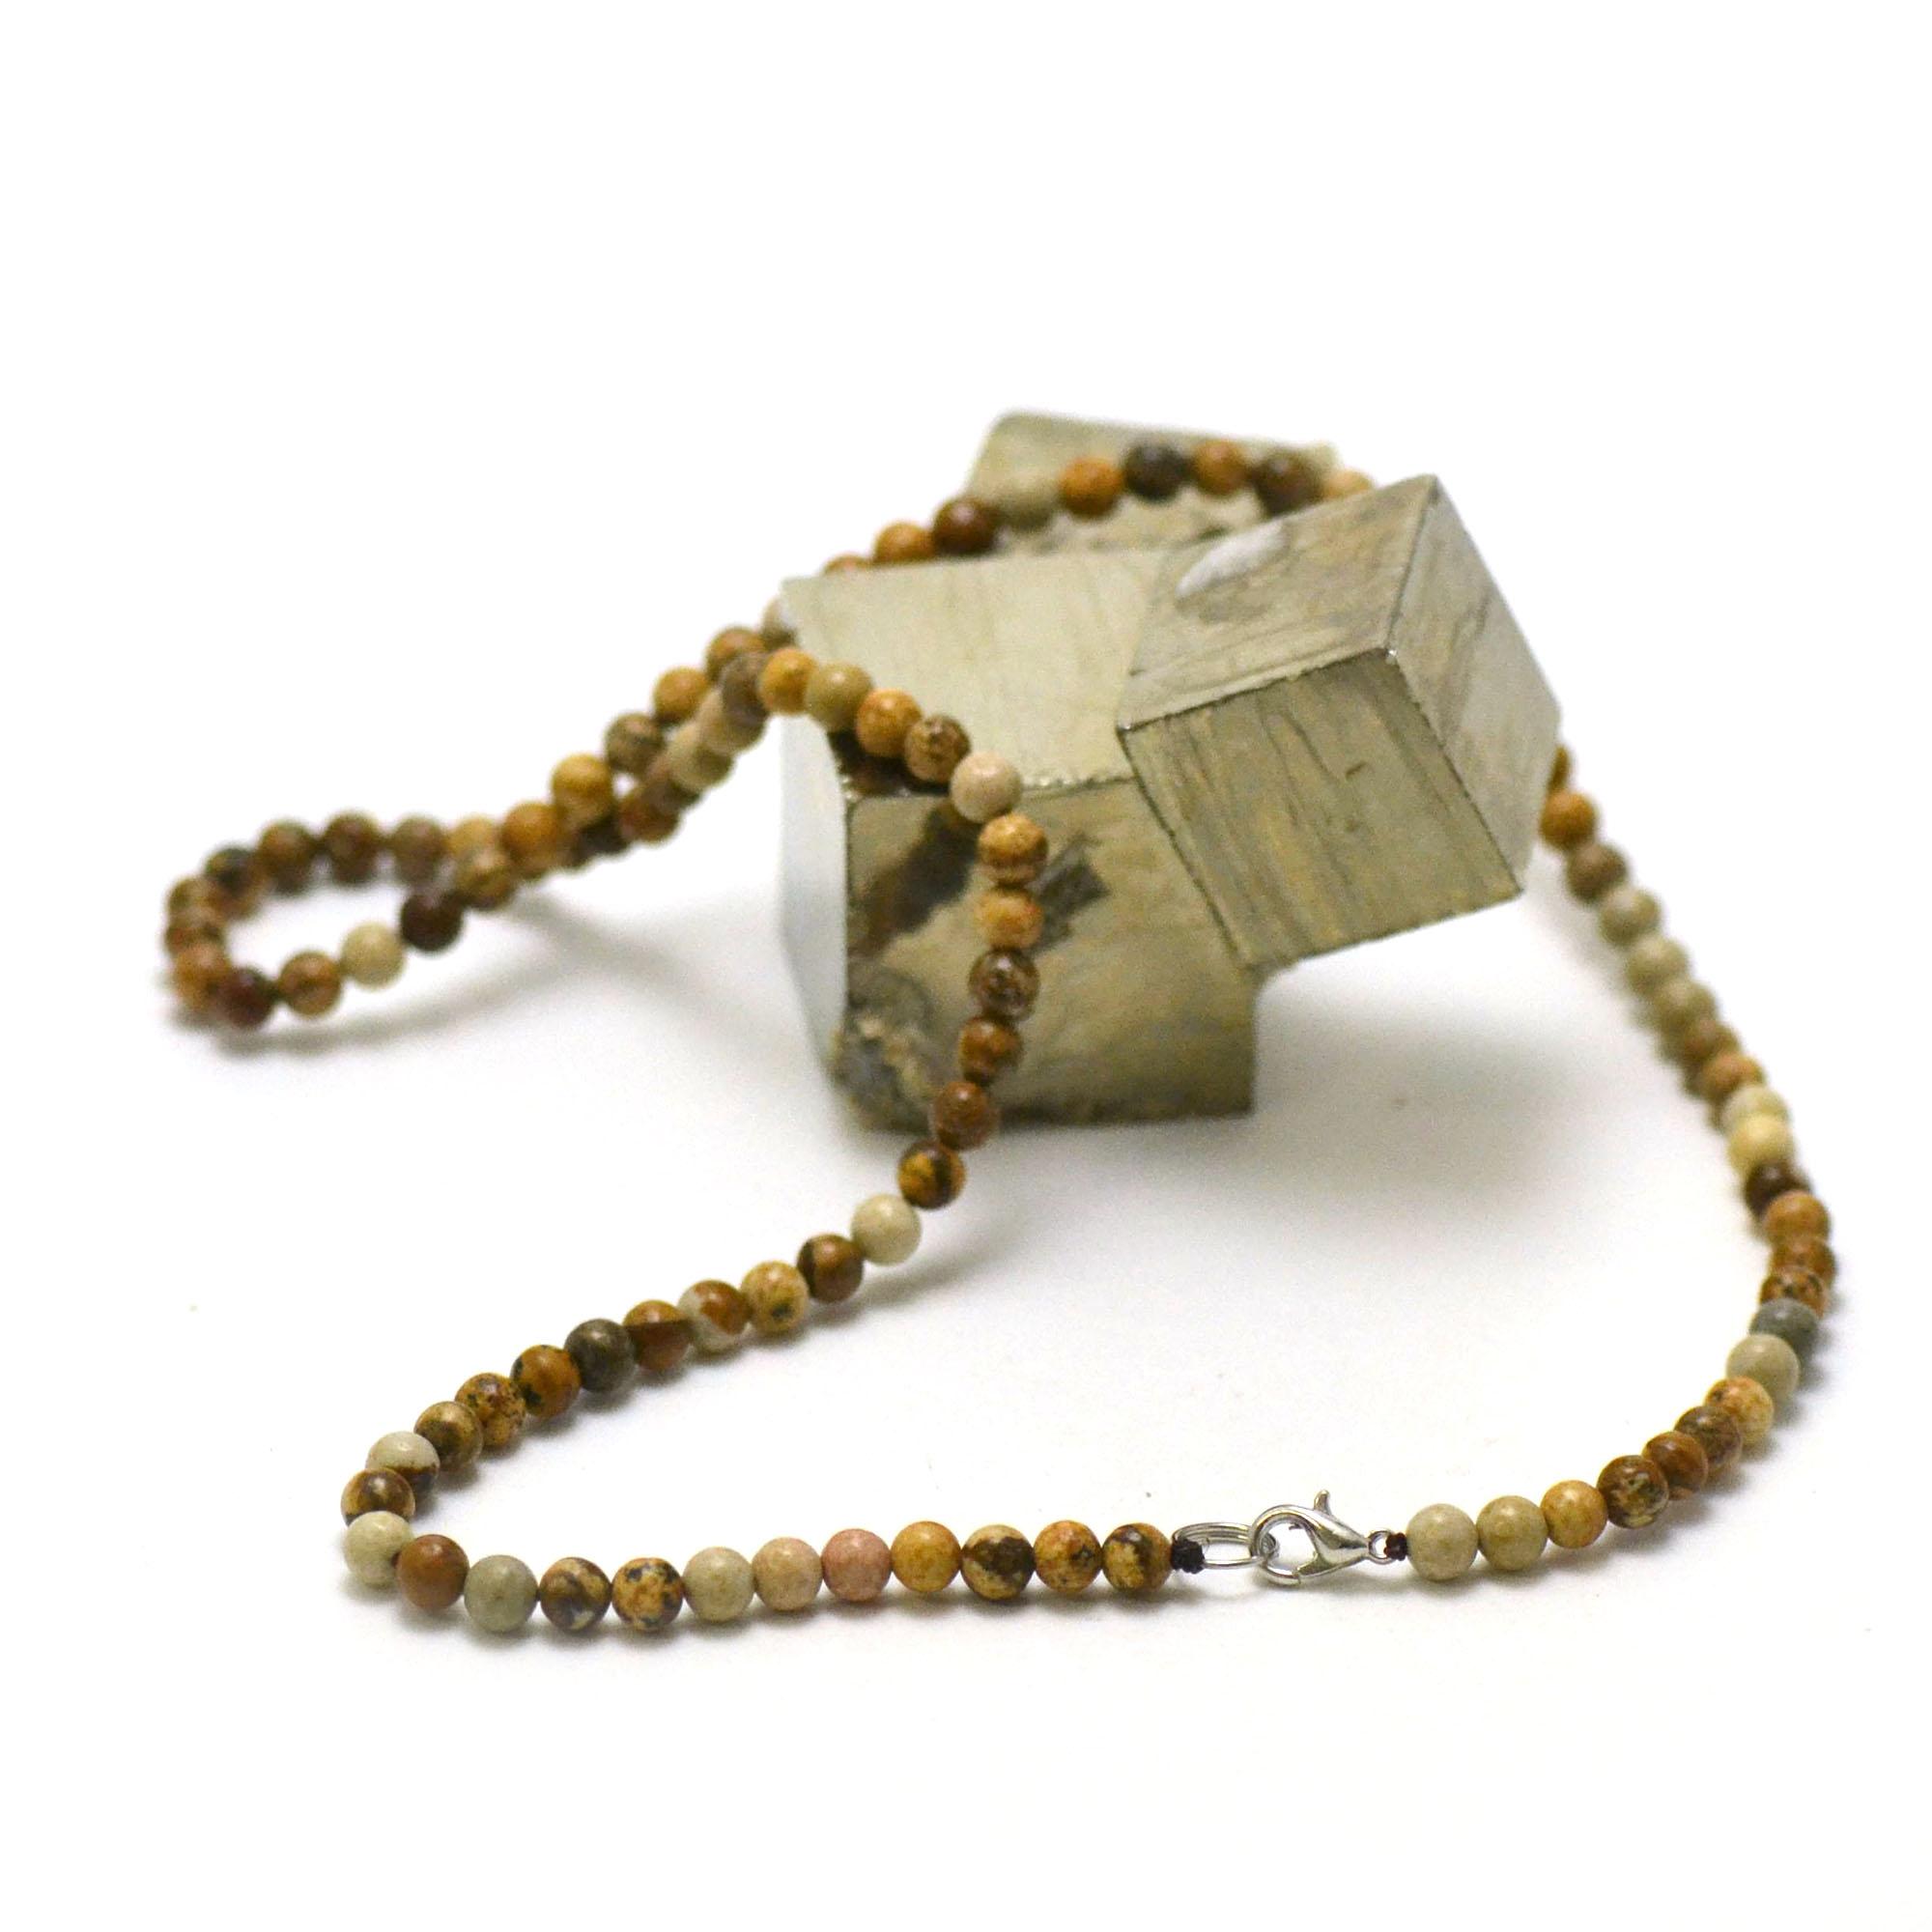 collier en jaspe paysage, perle ronde 4 mm